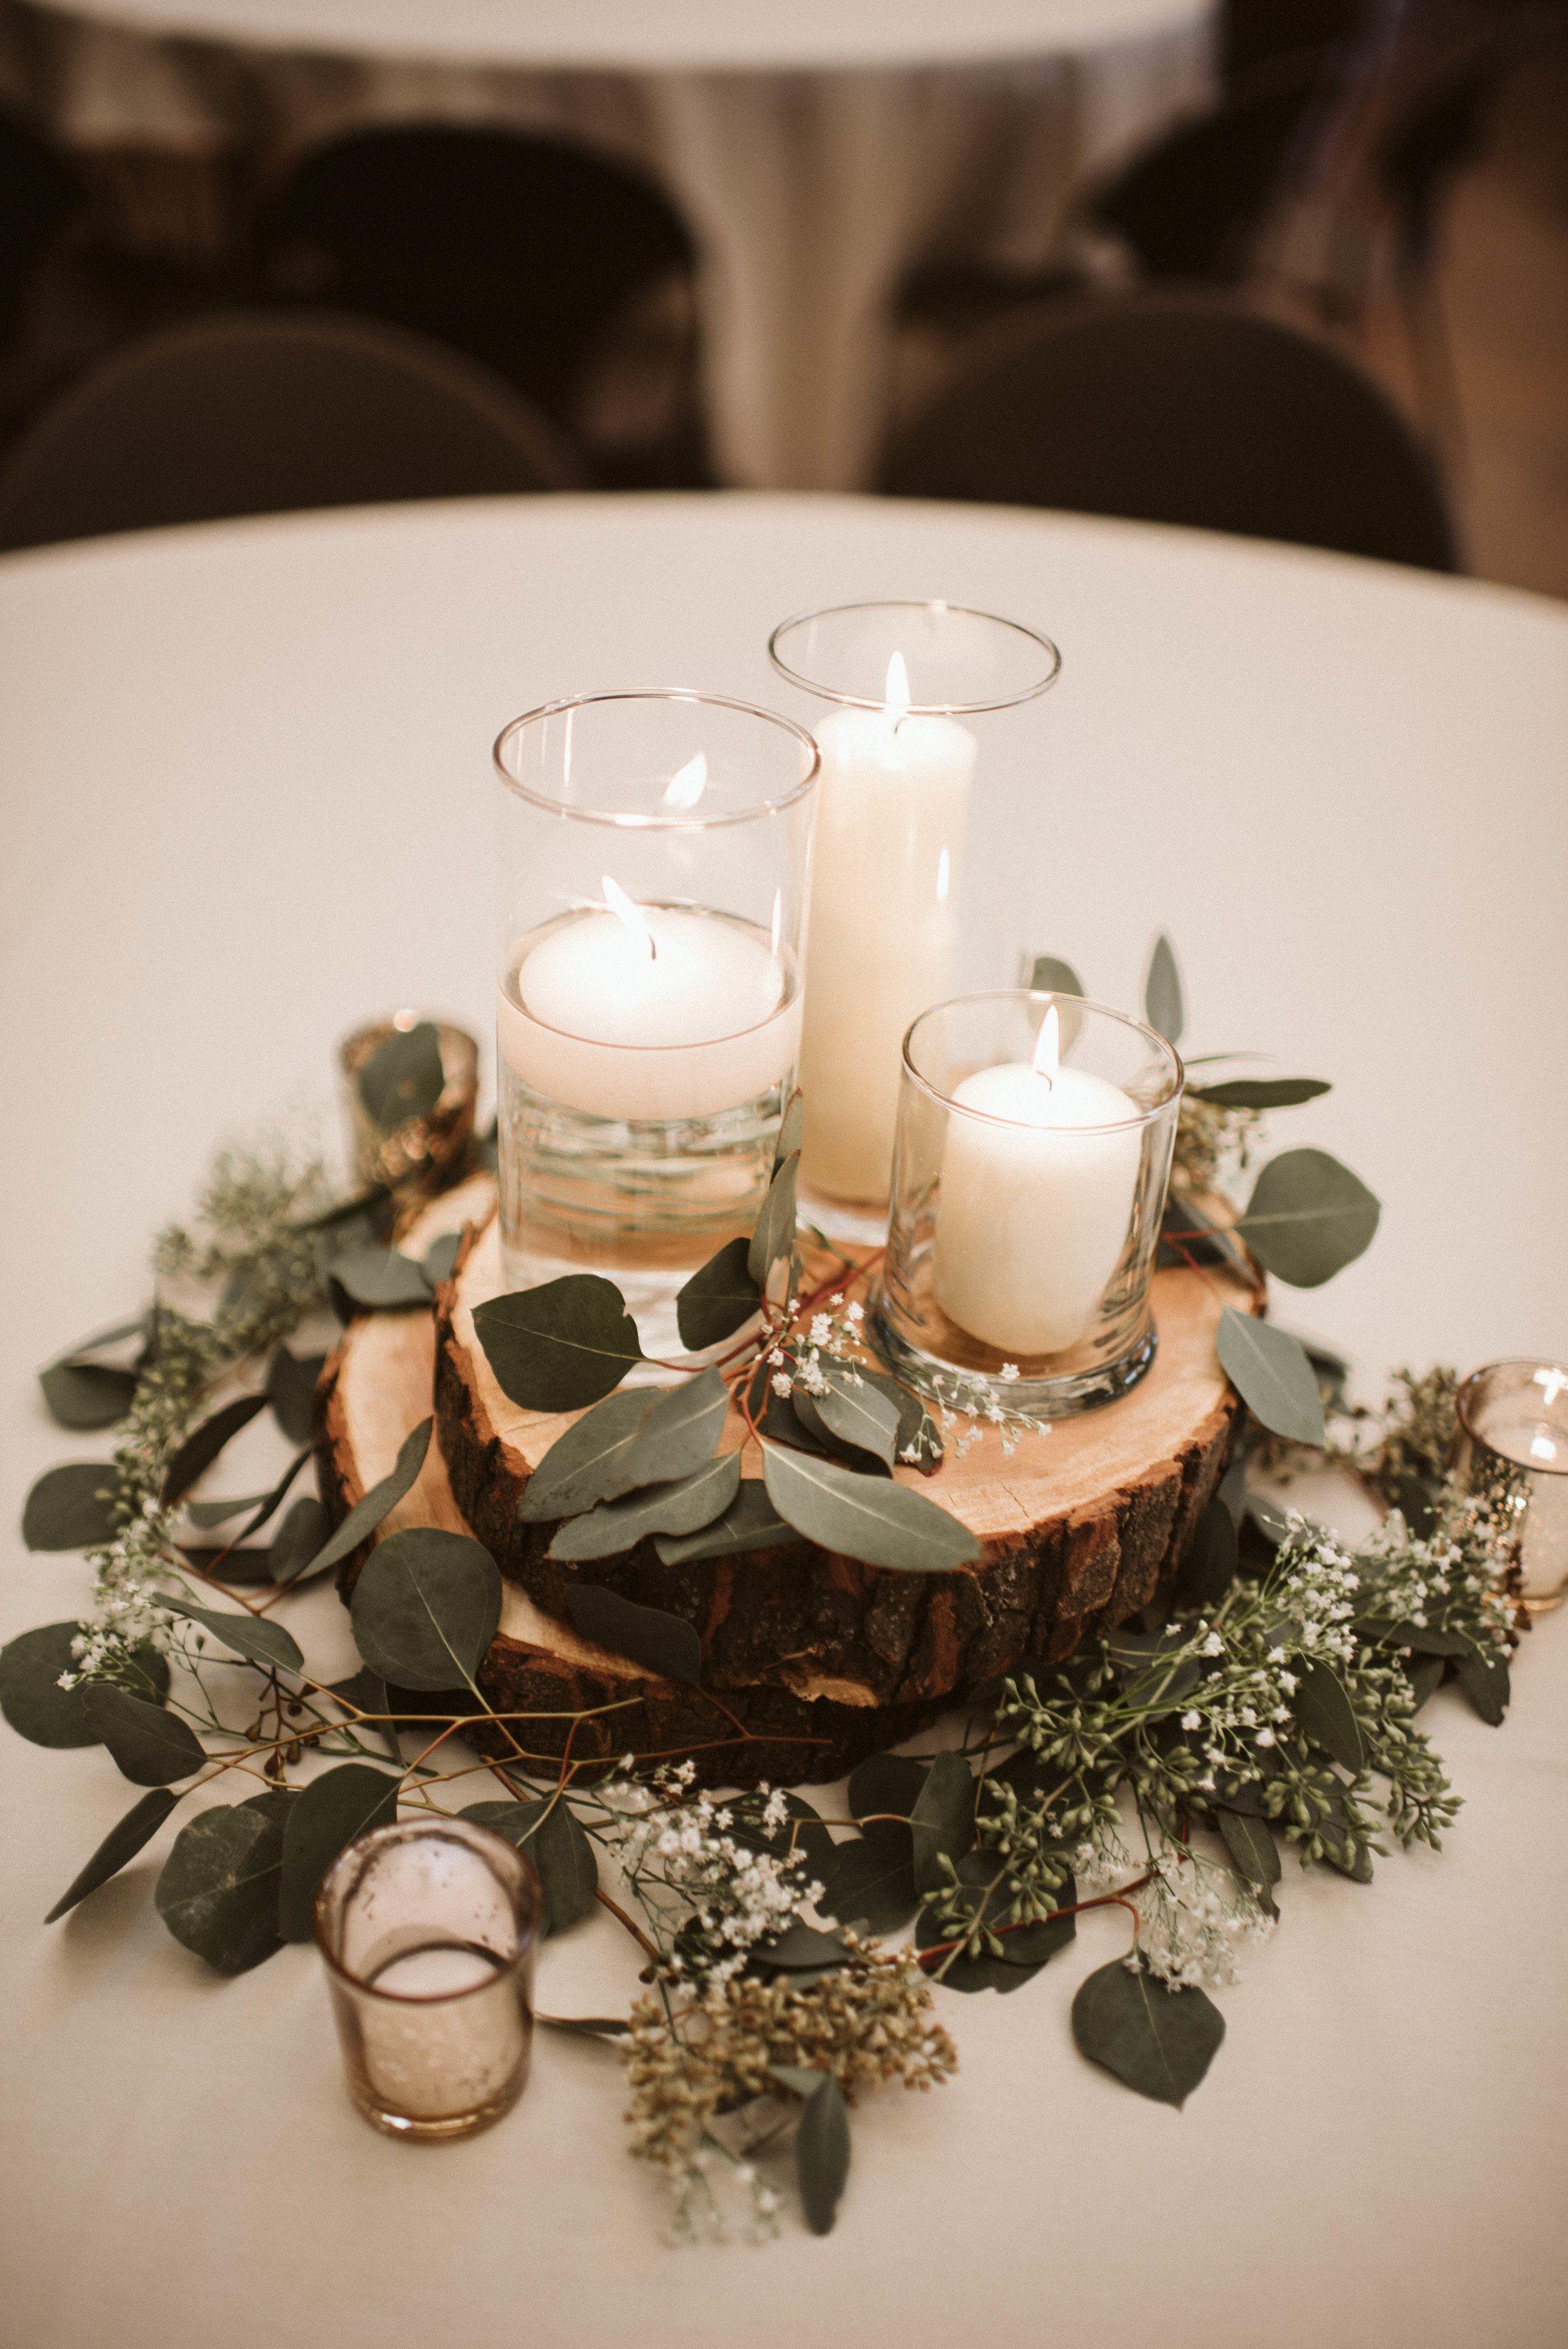 Meredithgravesphotography Rustic Wedding Decor Table Setting Wedding Ta Simple Wedding Centerpieces Rustic Wedding Table Budget Friendly Wedding Centerpieces